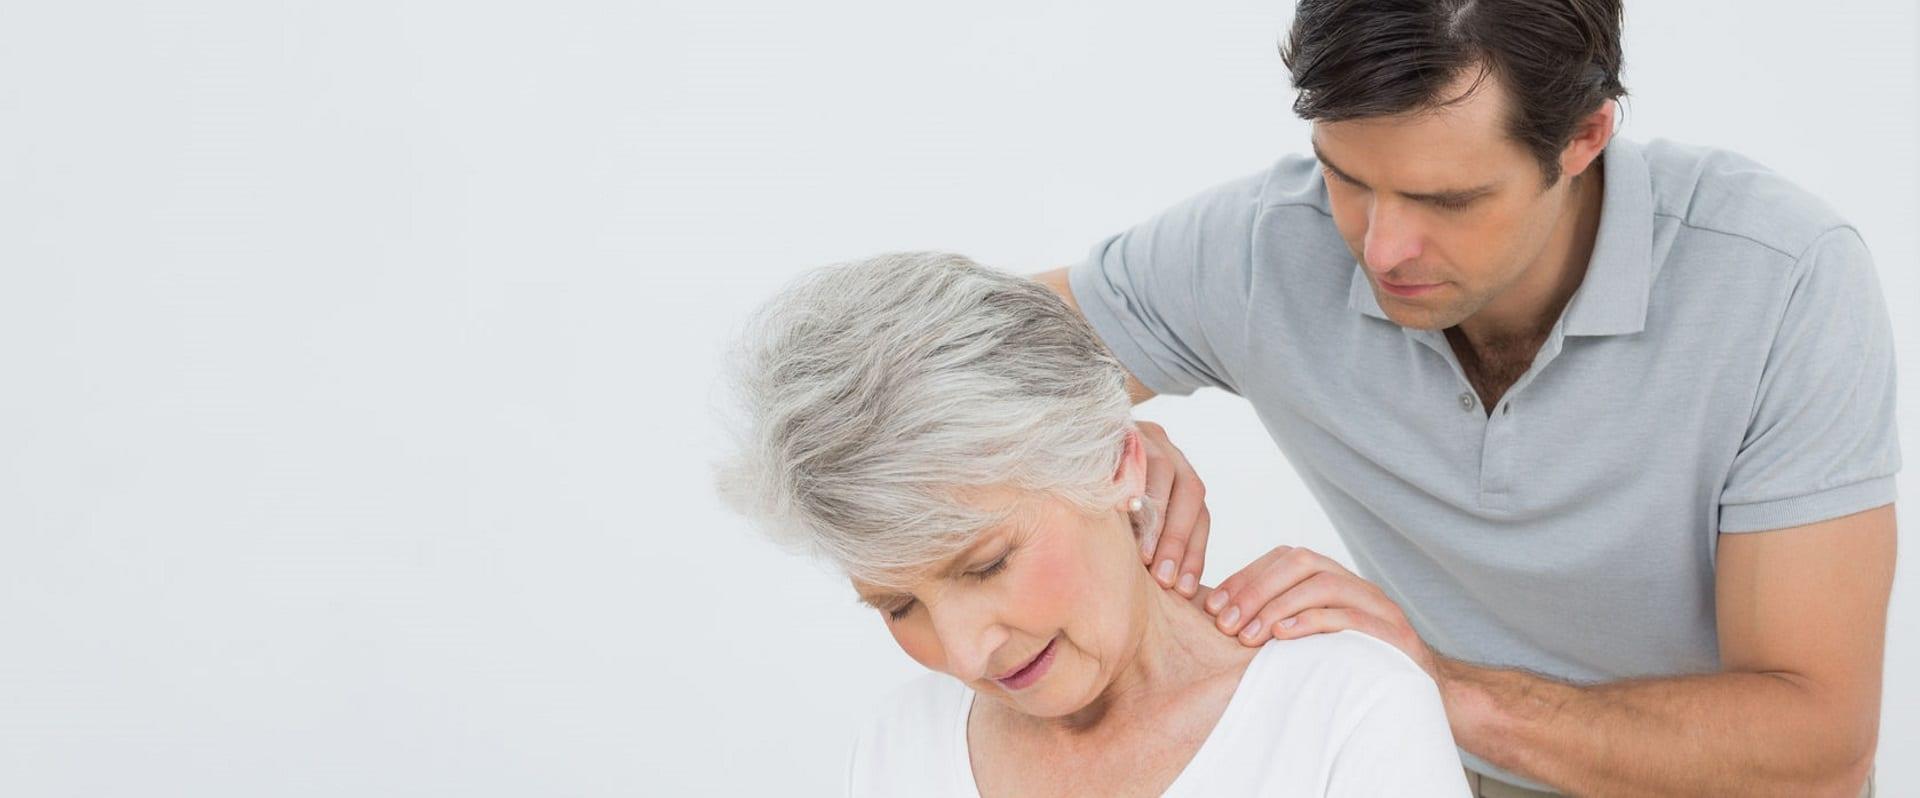 Neck pain; Plympton Osteopathic Clinic